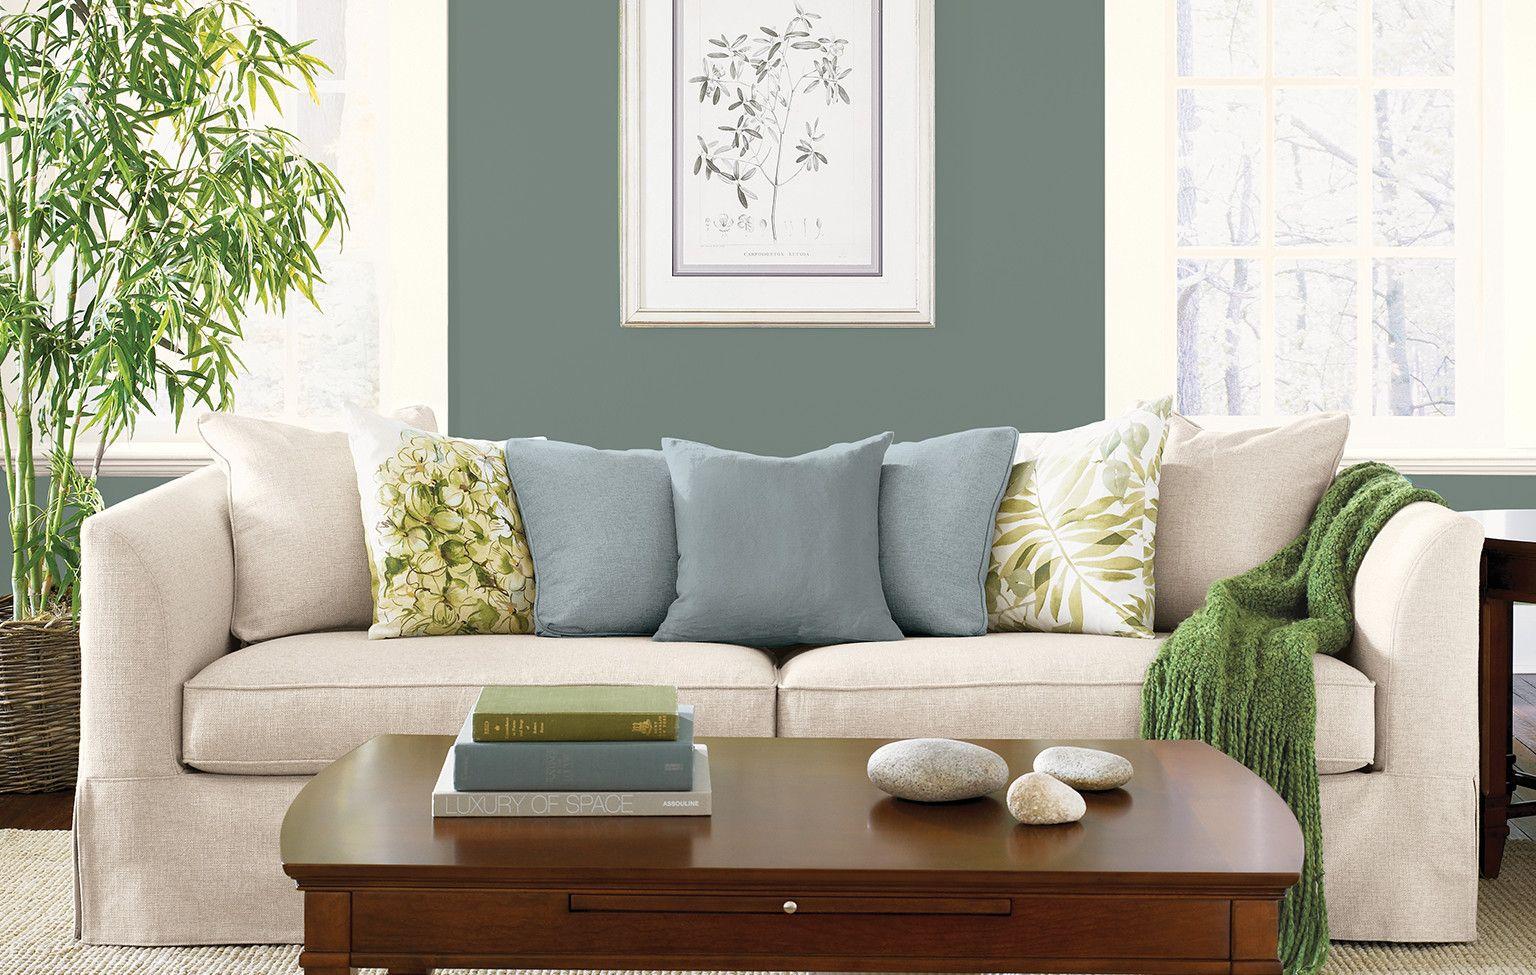 Living Room Color Schemes  Living Room Colors Room Colors And Amusing Colorful Living Room Ideas Design Ideas